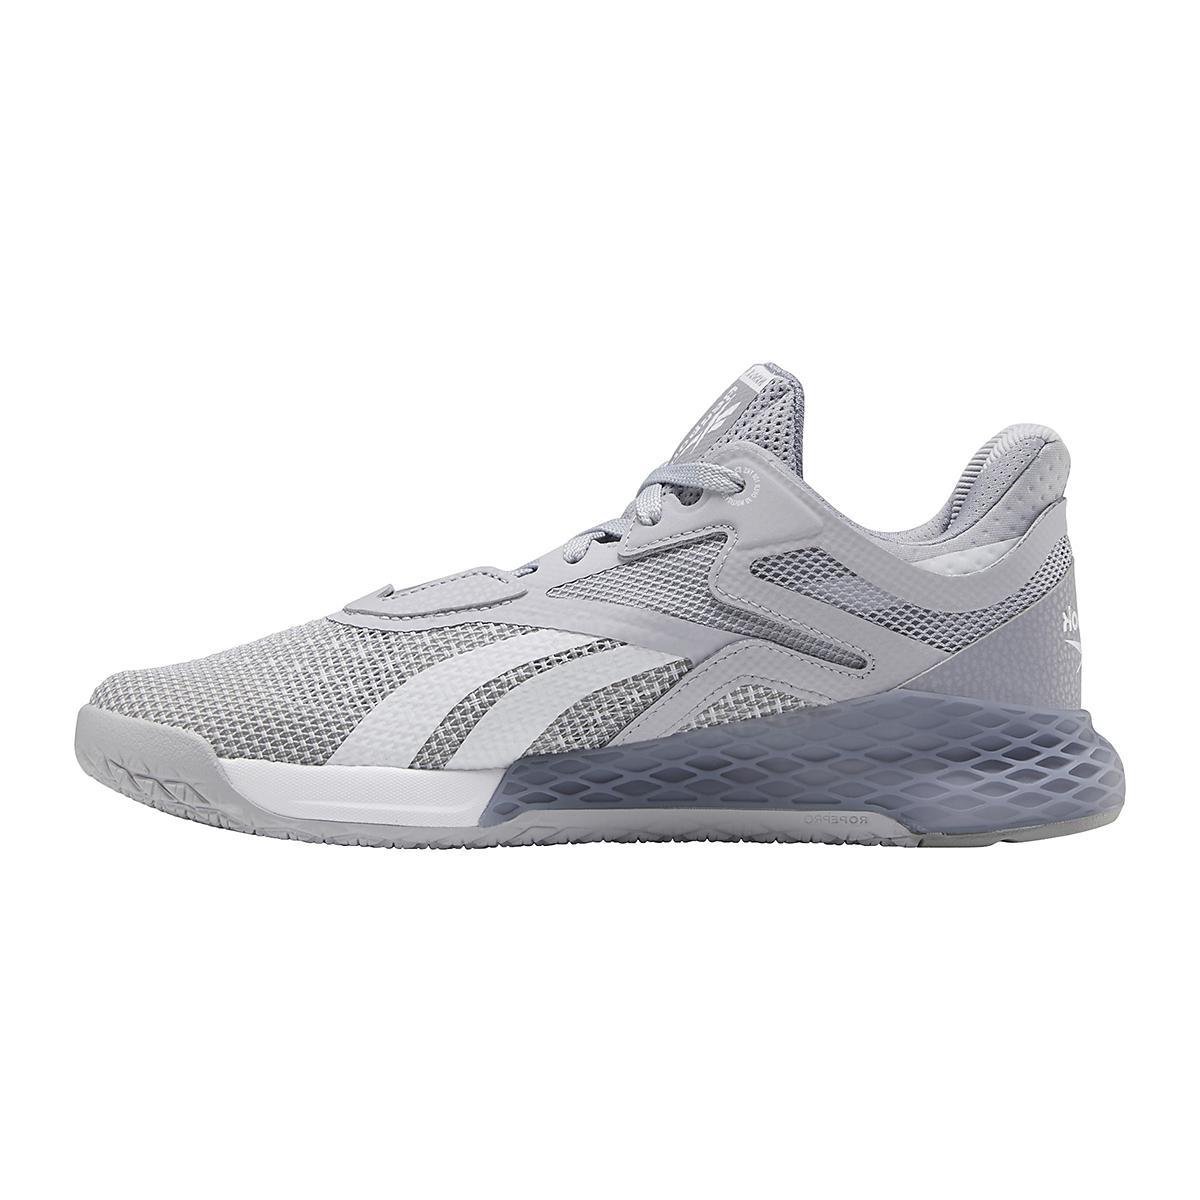 Women's Reebok Nano X Training Shoe - Color: Cold Grey/Cool Shadow/White - Size: 5 - Width: Regular, Cold Grey/Cool Shadow/White, large, image 2